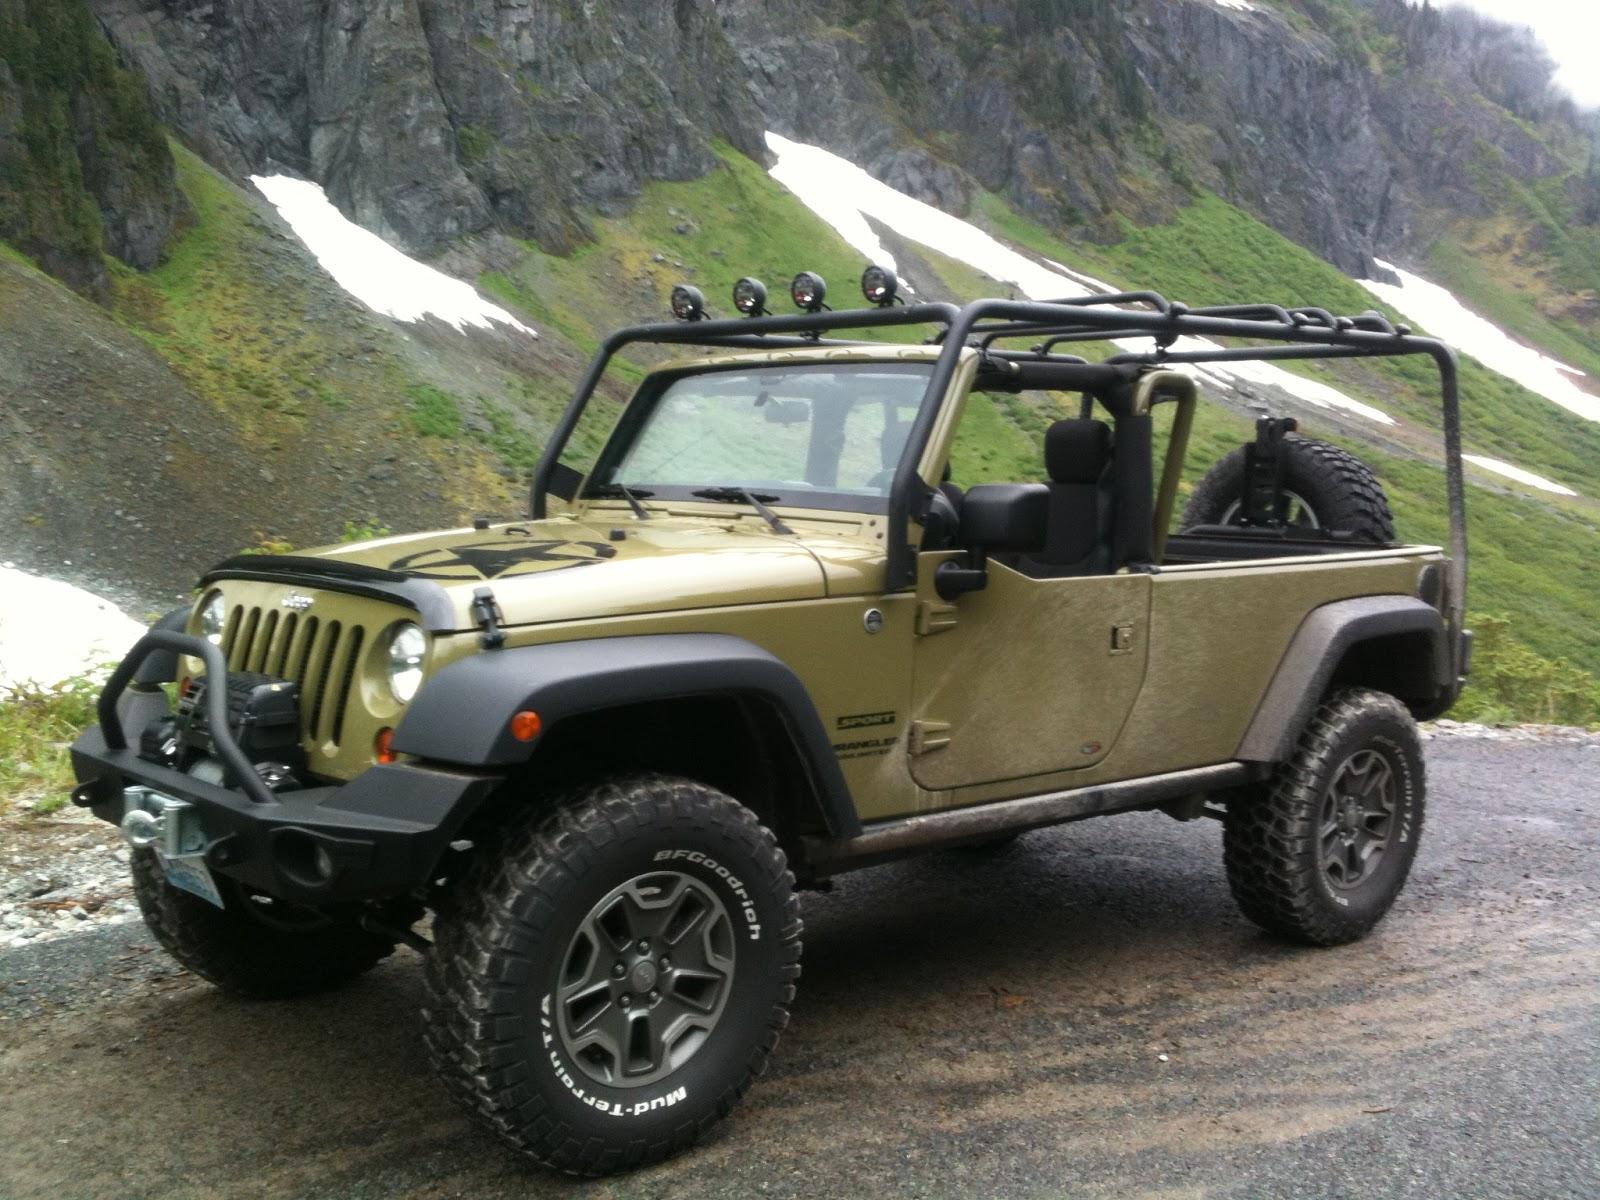 Jeep Wrangler Jk8 >> 2013 Jeep Wrangler JK8 Conversion